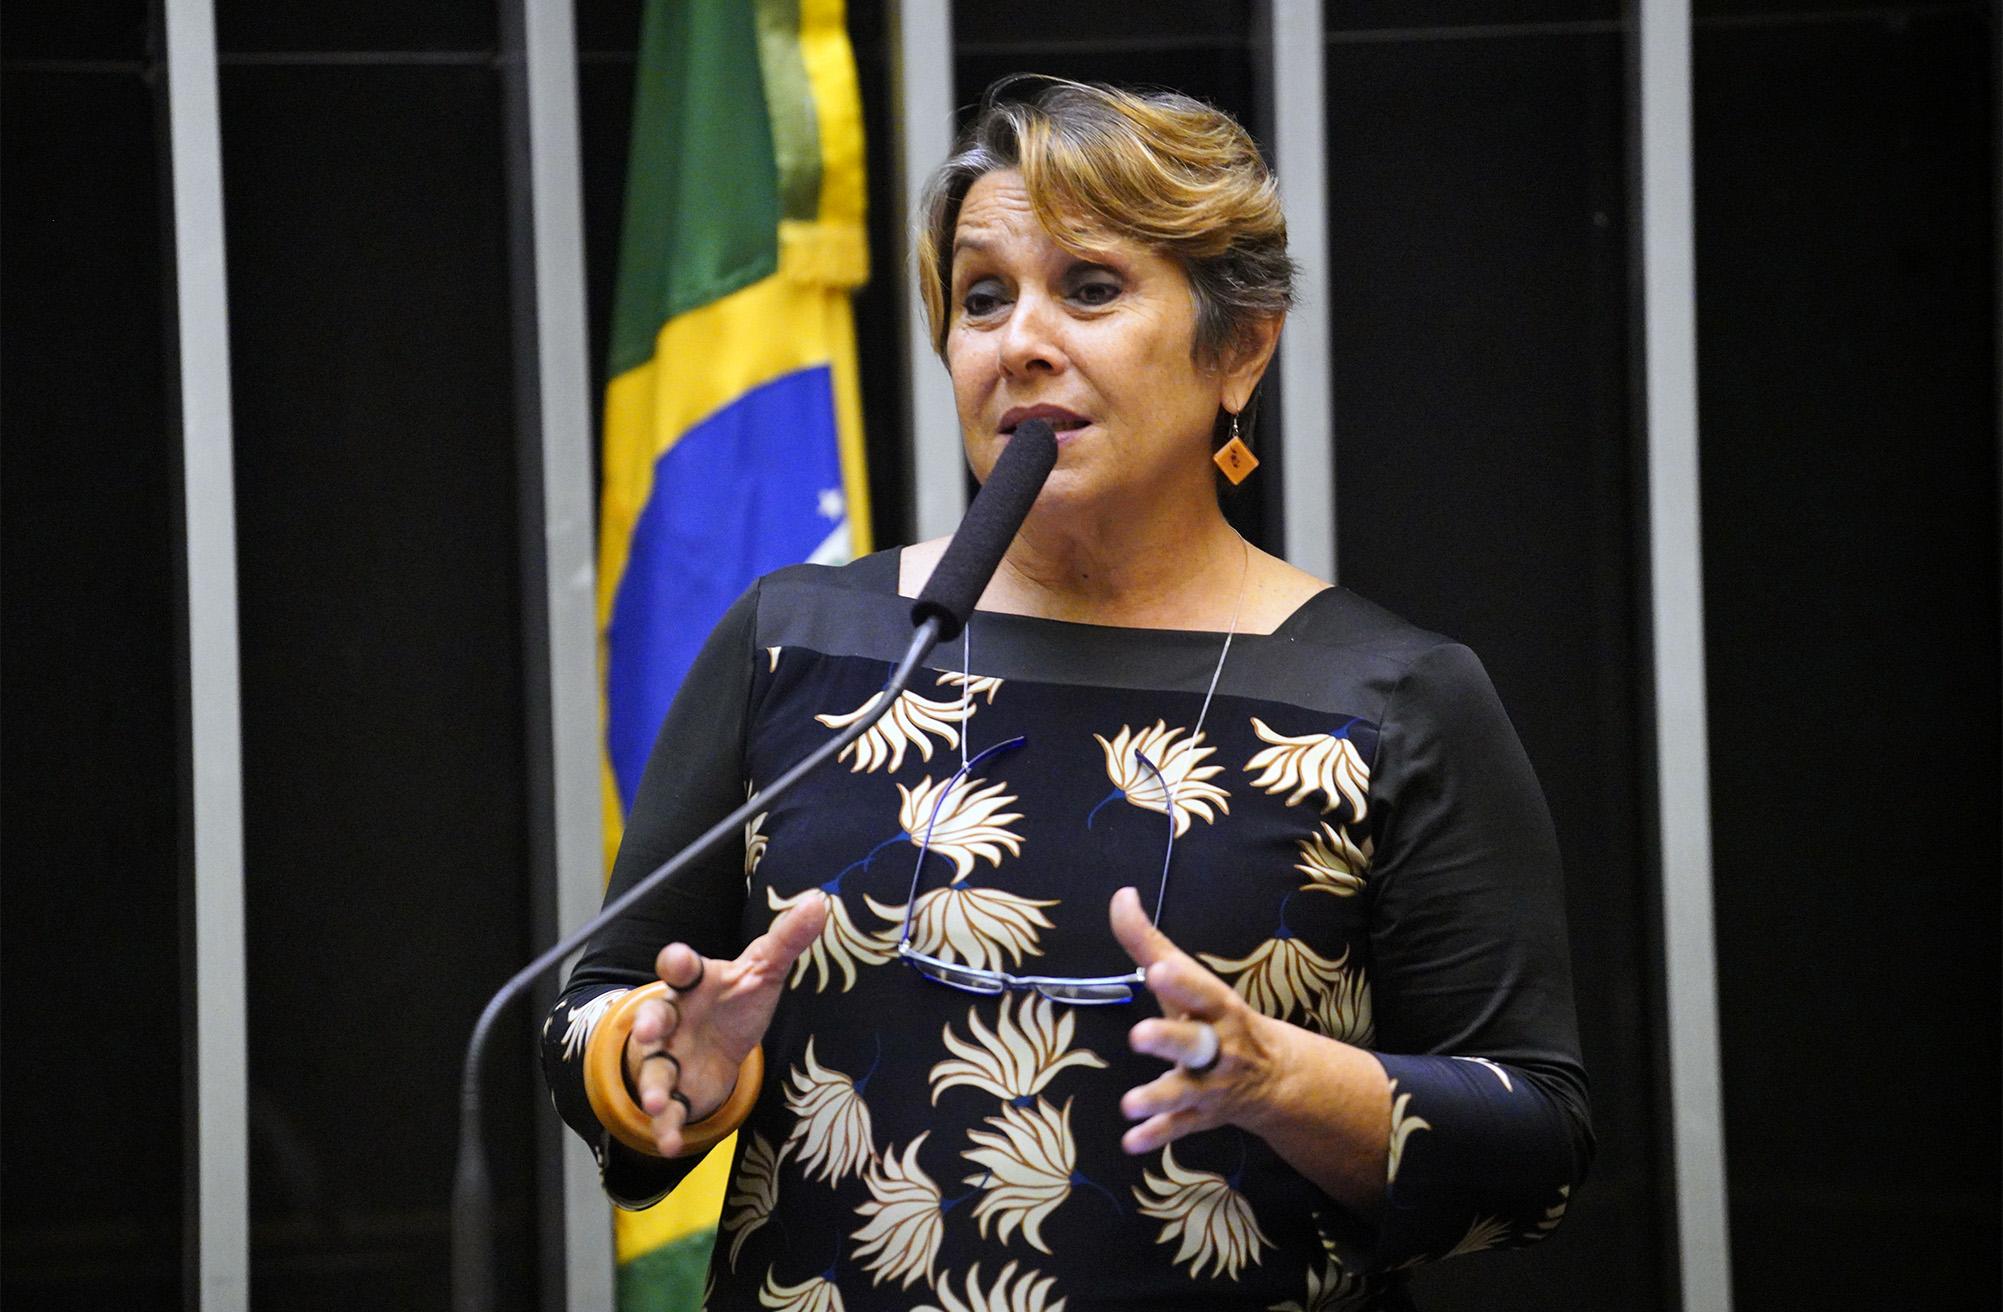 Entrega do Diploma Mulher-Cidadã Carlota Pereira de Queirós 2018. Dep. Érika Kokay (PT-DF)